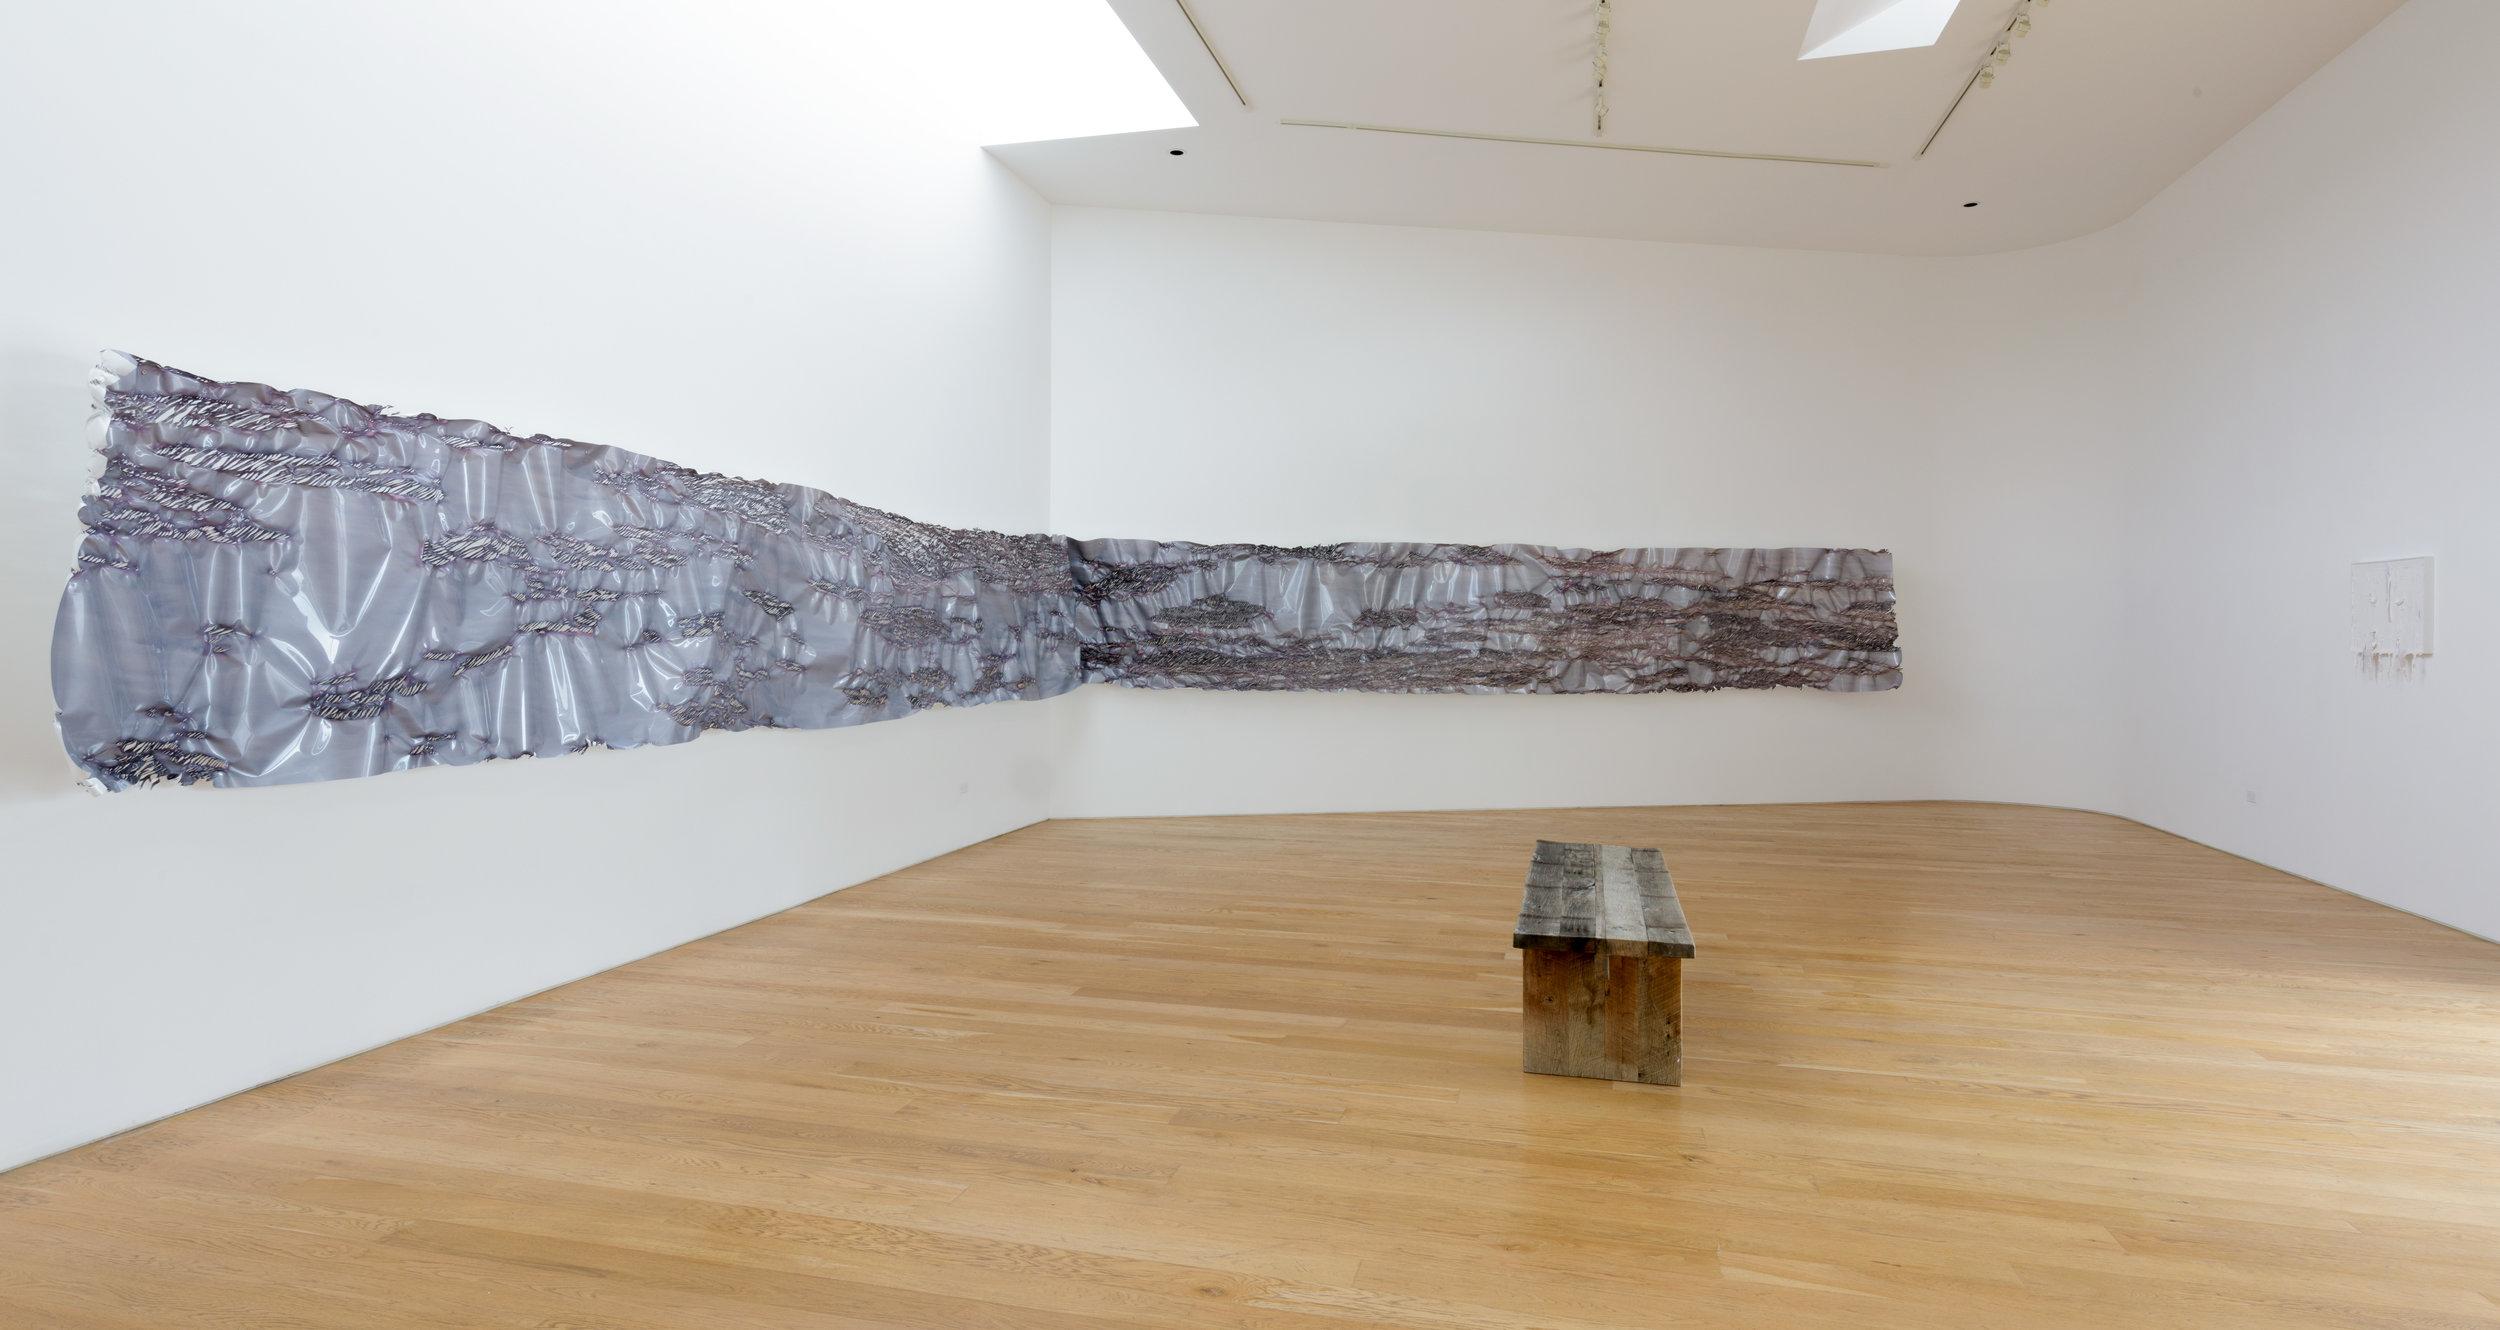 Ben Buswell, Mineo Mizuno Installation View, 2016